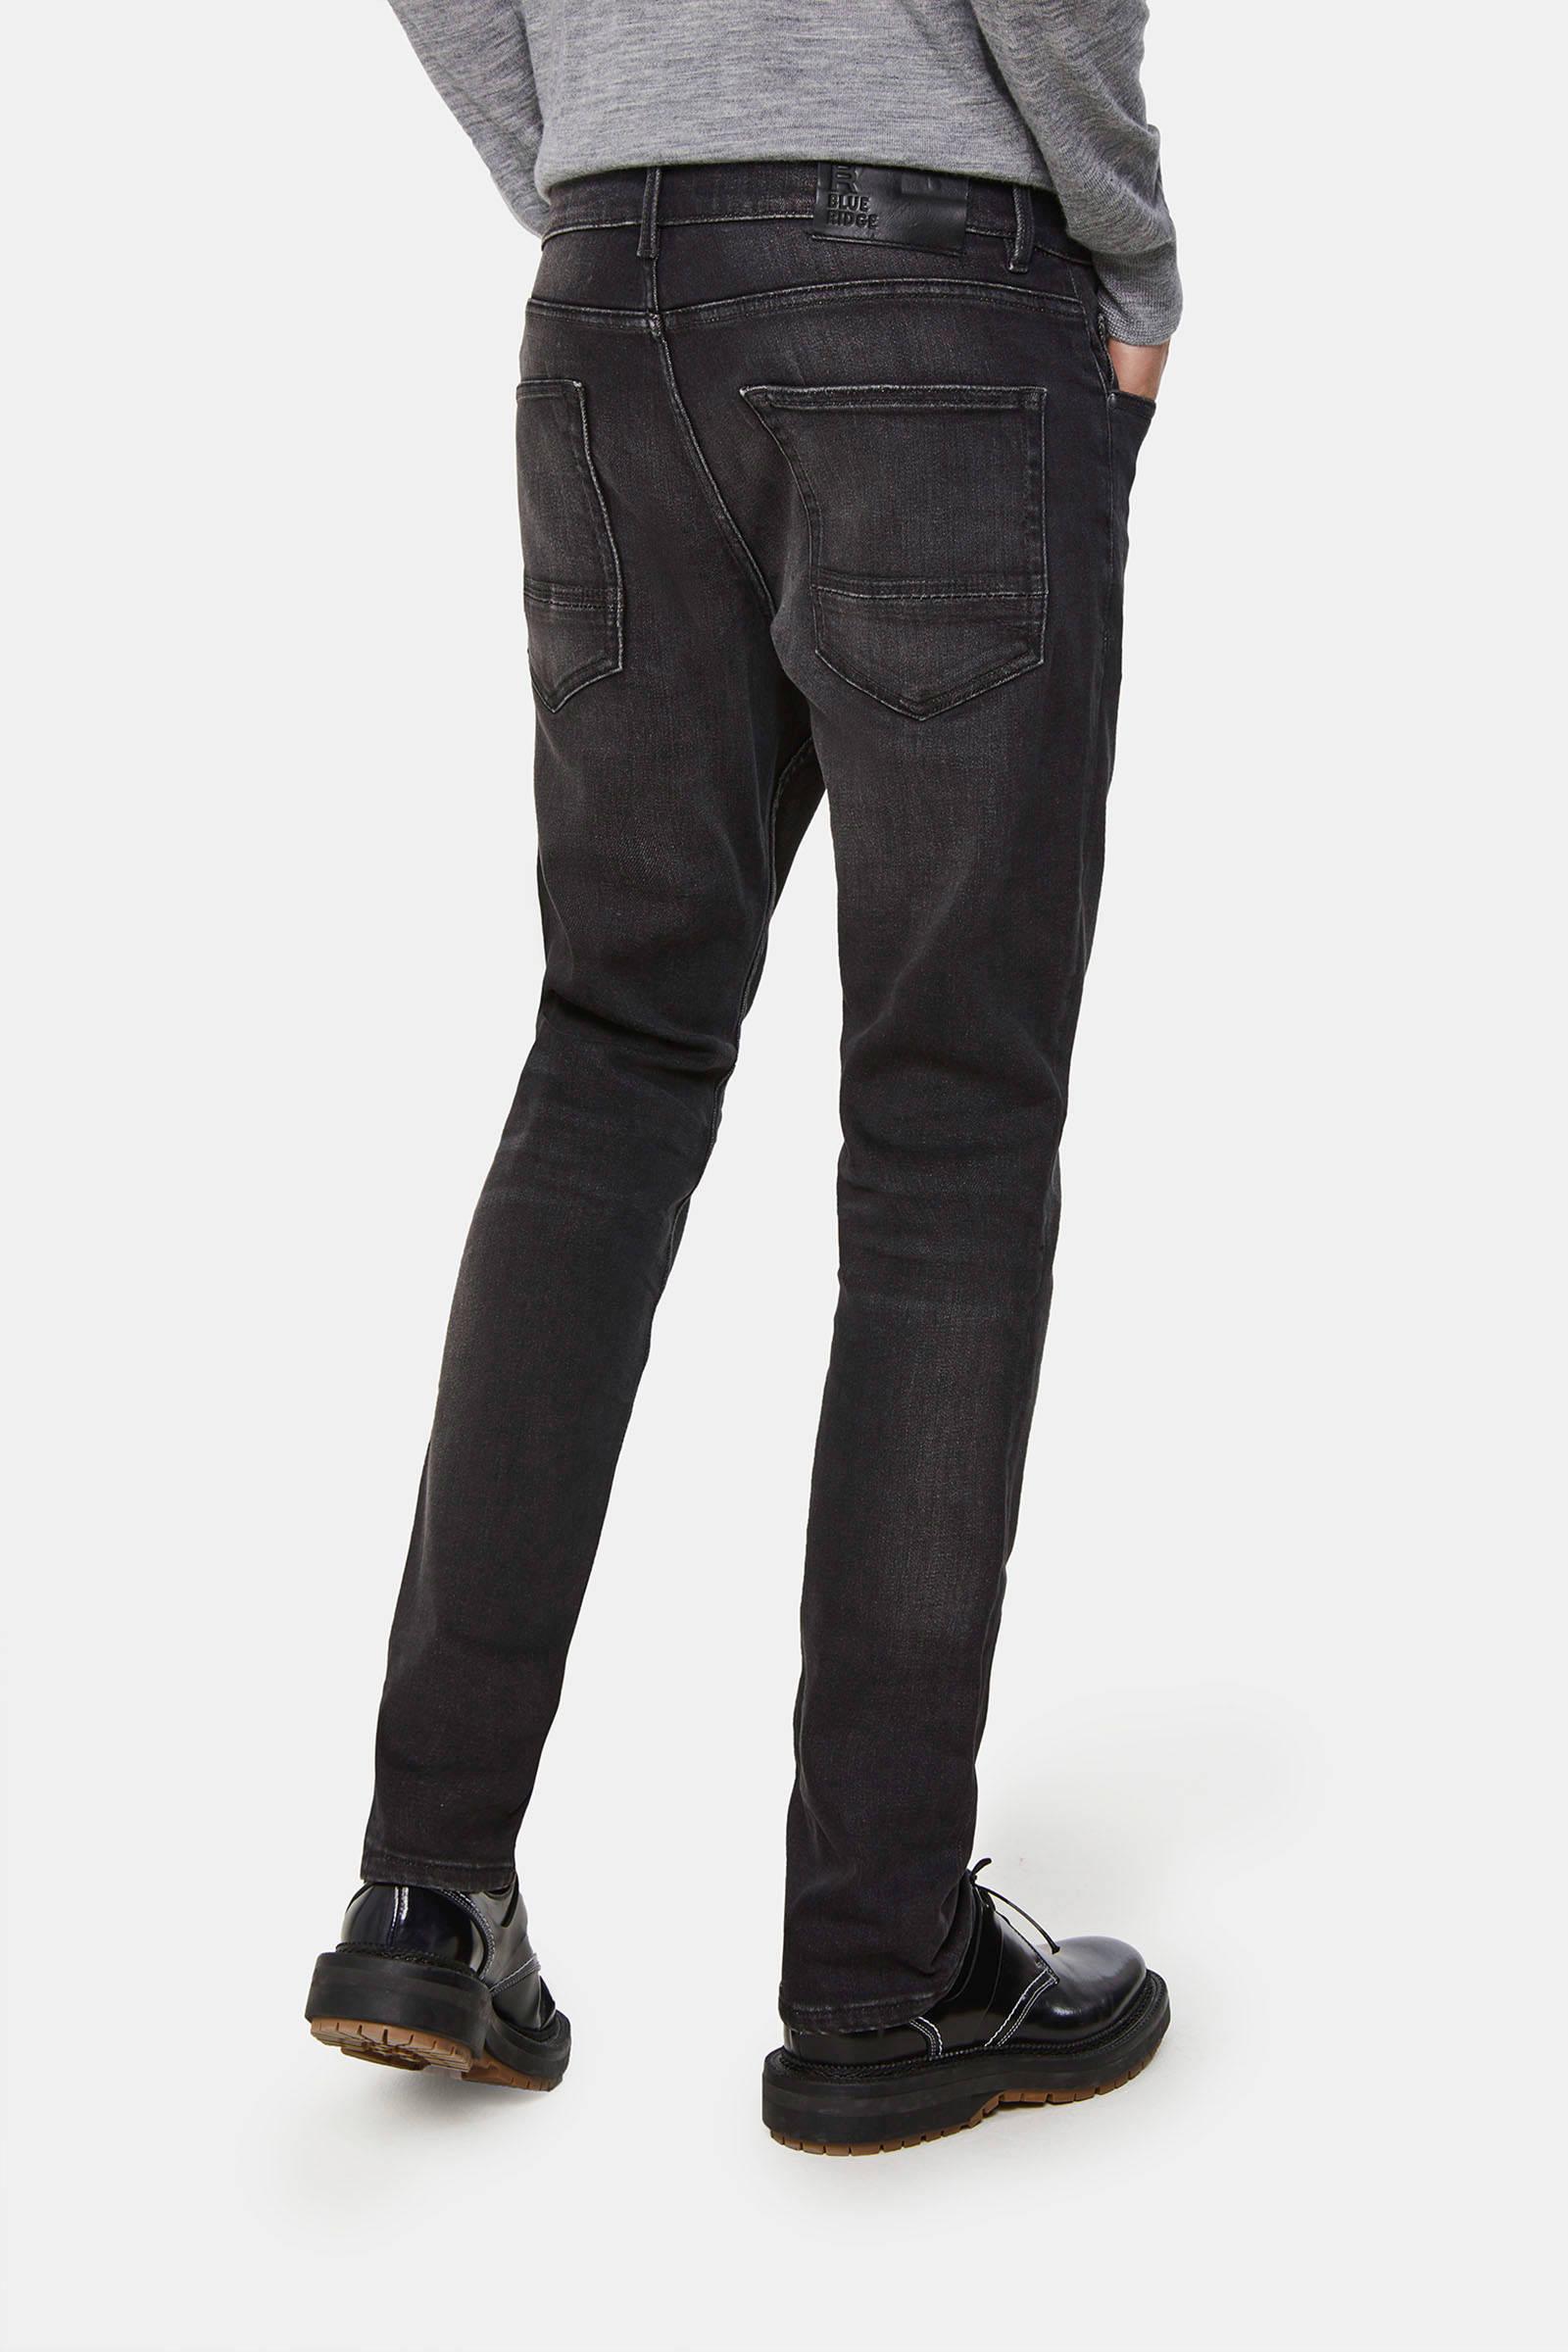 WE Fashion Blue Ridge slim fit jeans Blue ridge black jog